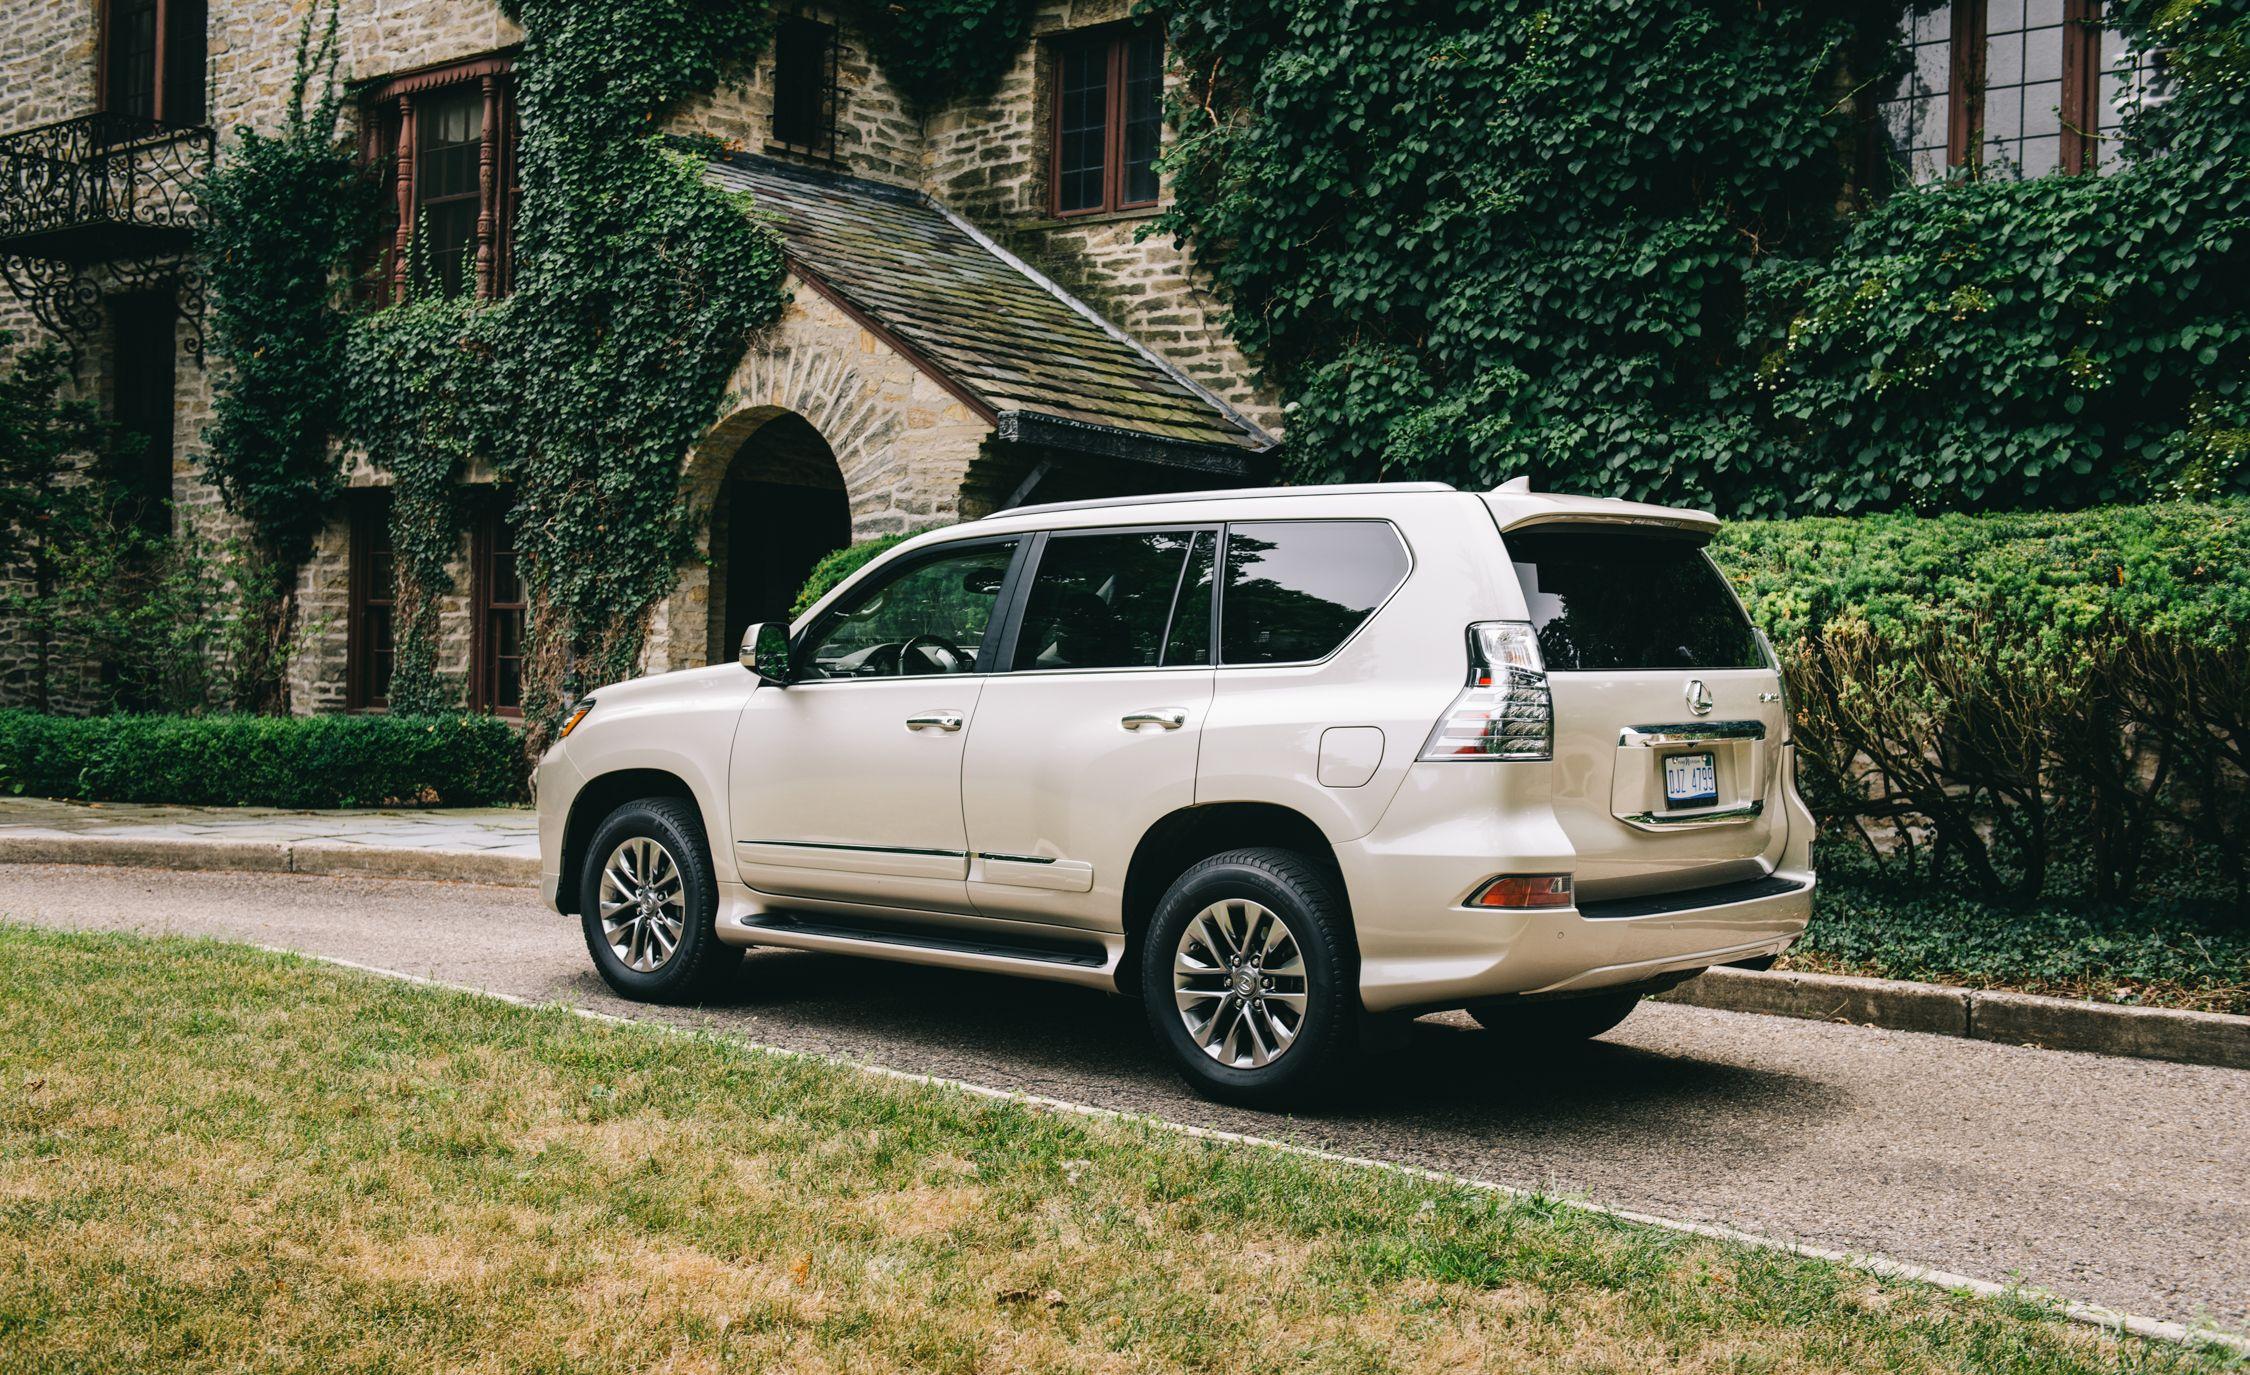 gx com cole news with hatch craig curbed review autoguide lexus manufacturer